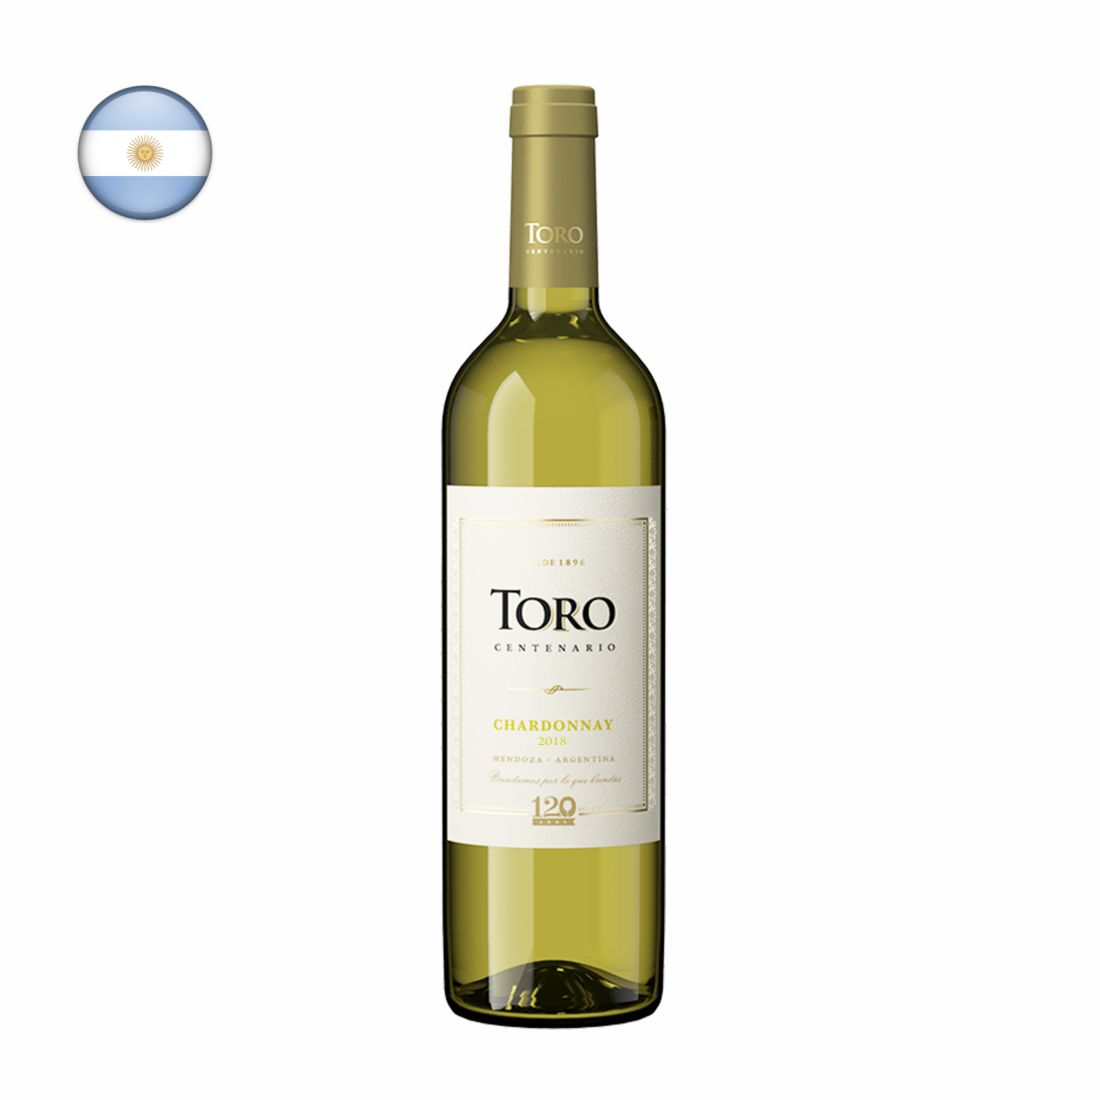 VINHO ARGENTINO TORO 750ML CHARDONAY